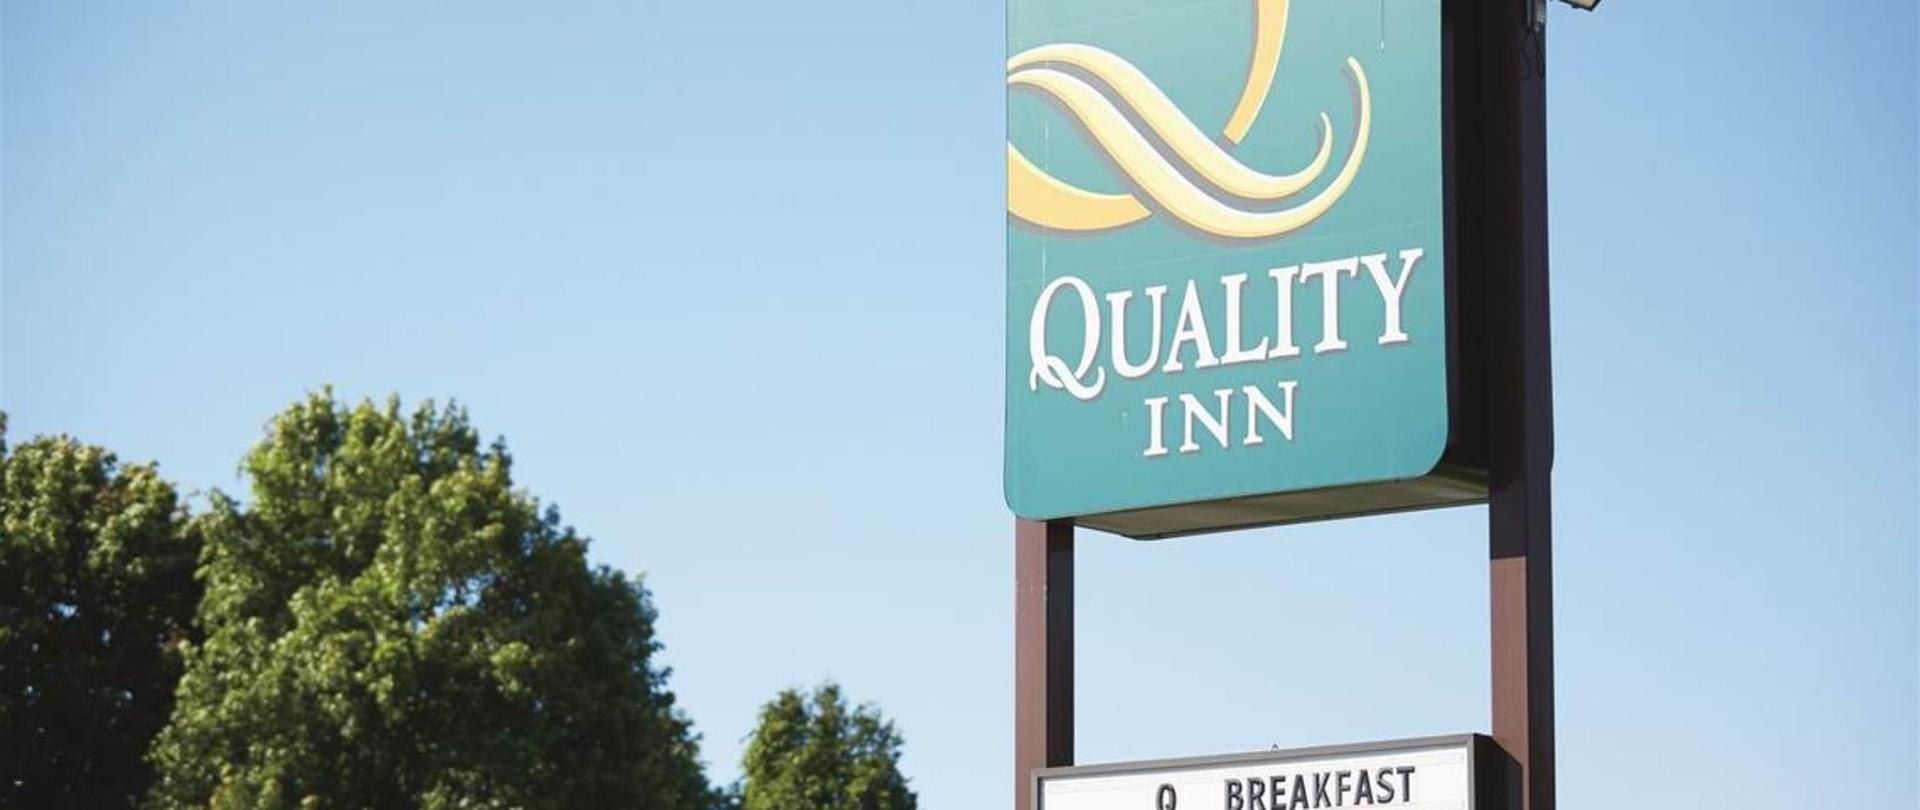 Quality Inn Southampton, Canada (6).jpg